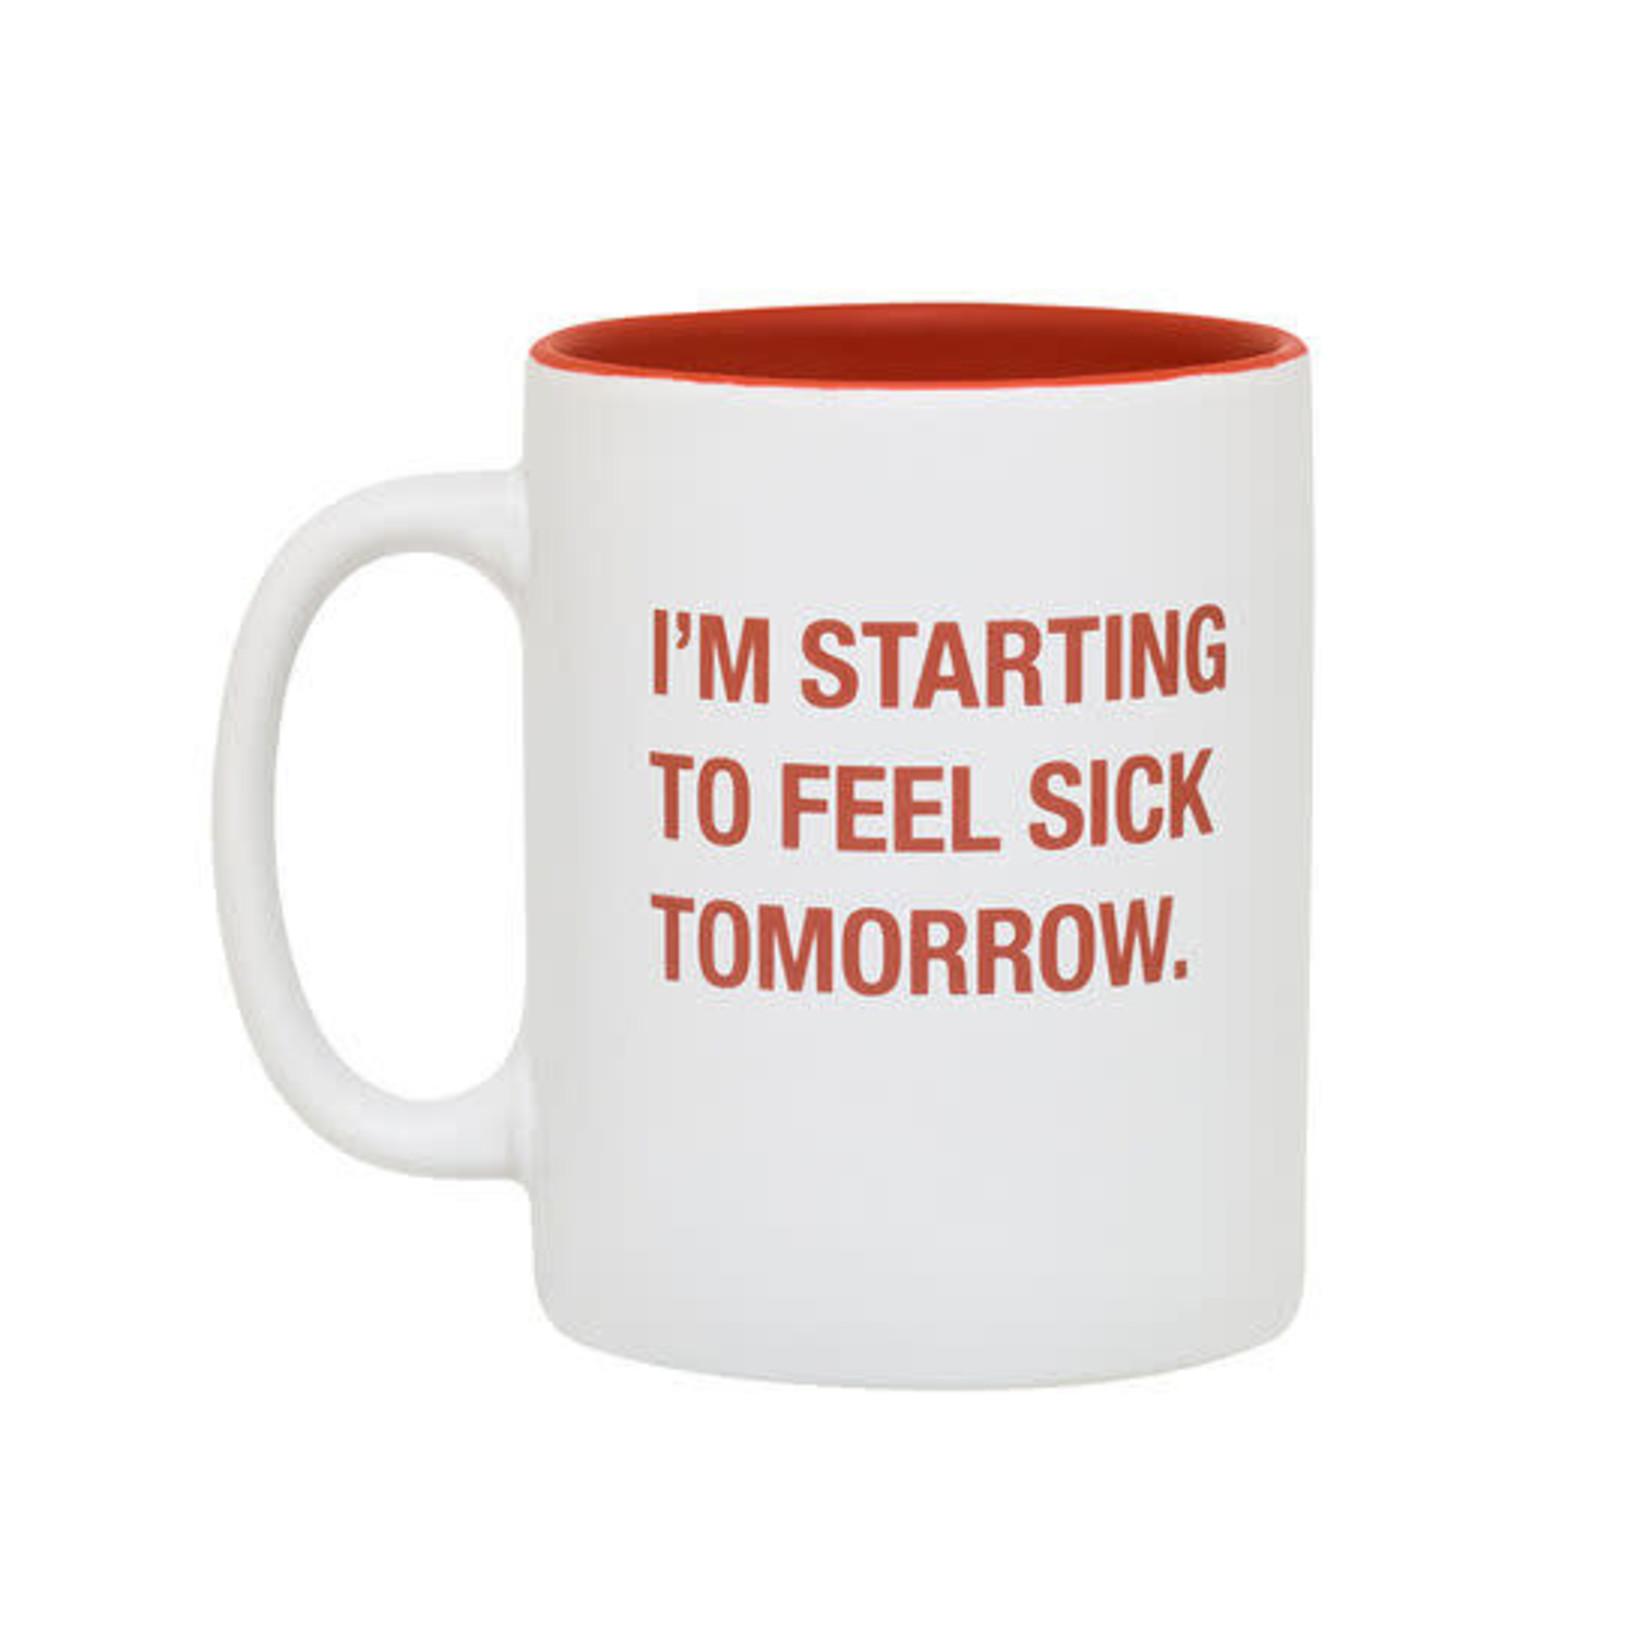 About Face Designs, Inc Mug: Feel Sick Tomorrow